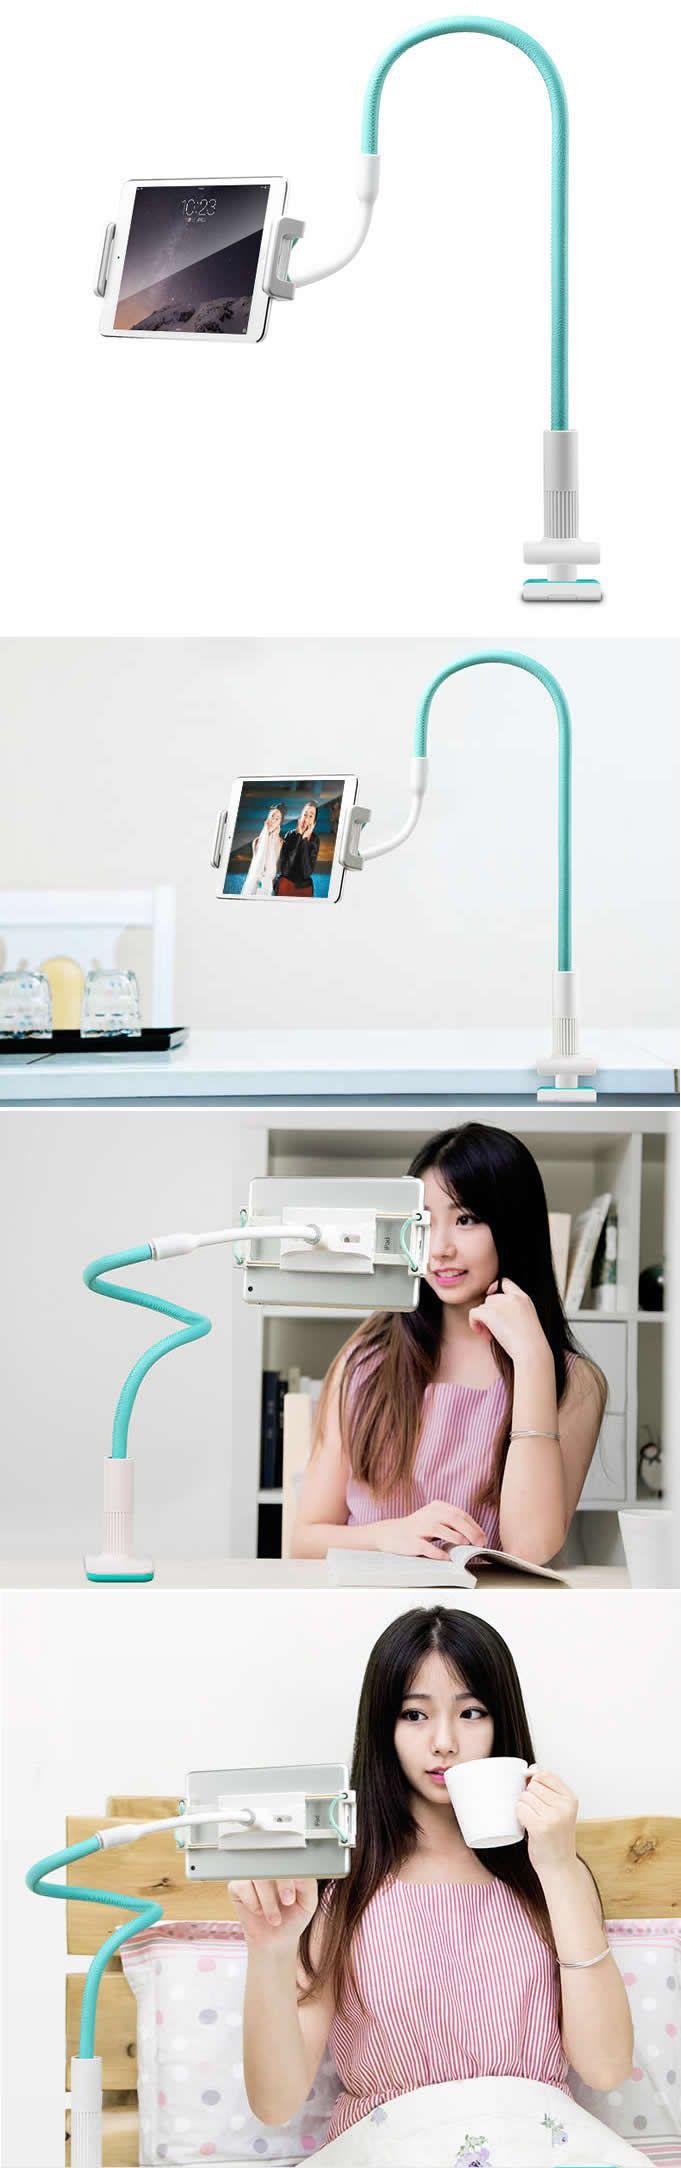 Flexible 360 Degrees Rotating Clip-on Table Bed Desk Mount Holder ...